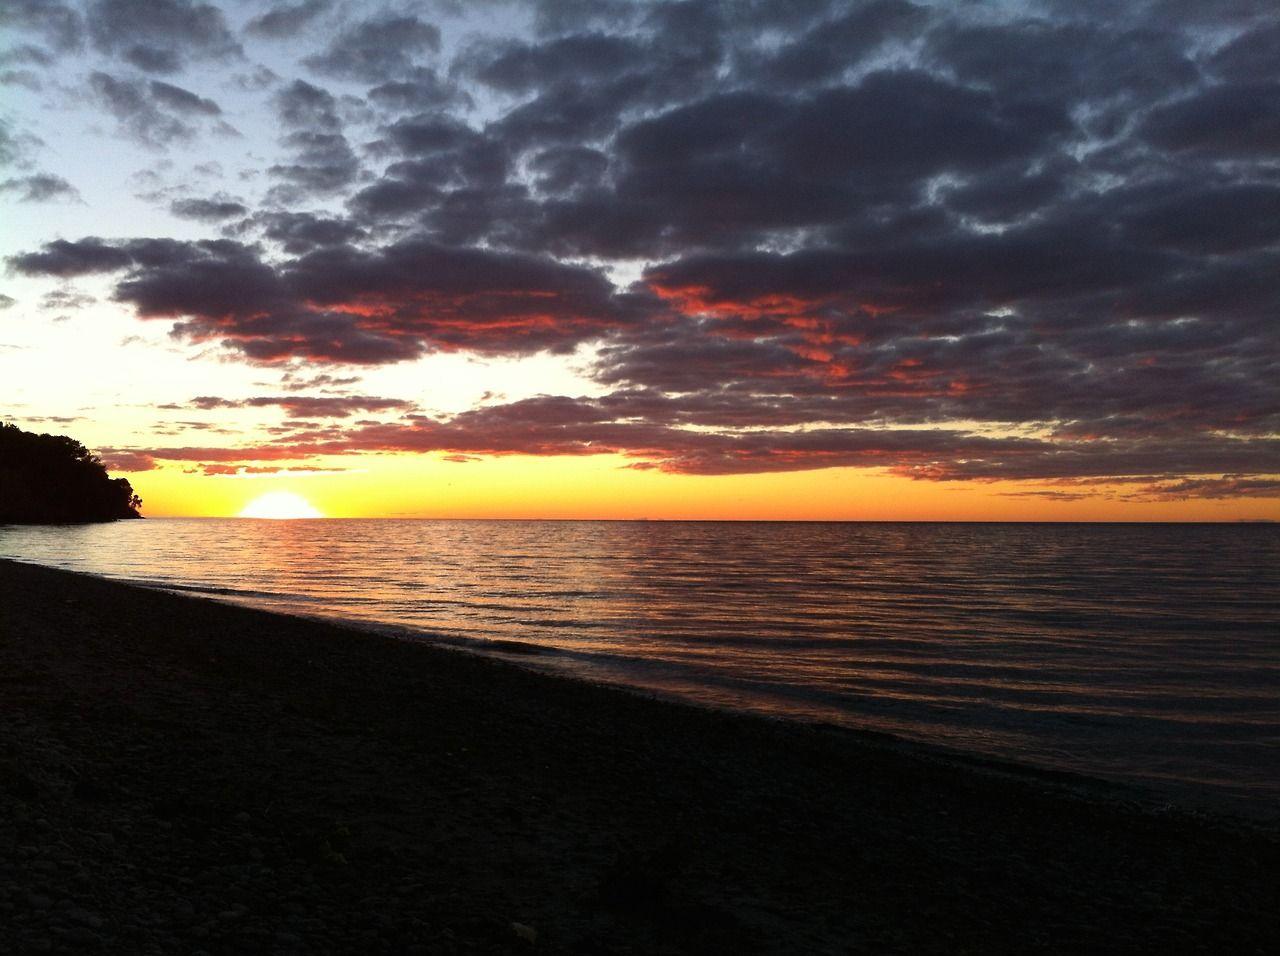 Západ slunce nad jezerem Ontario.